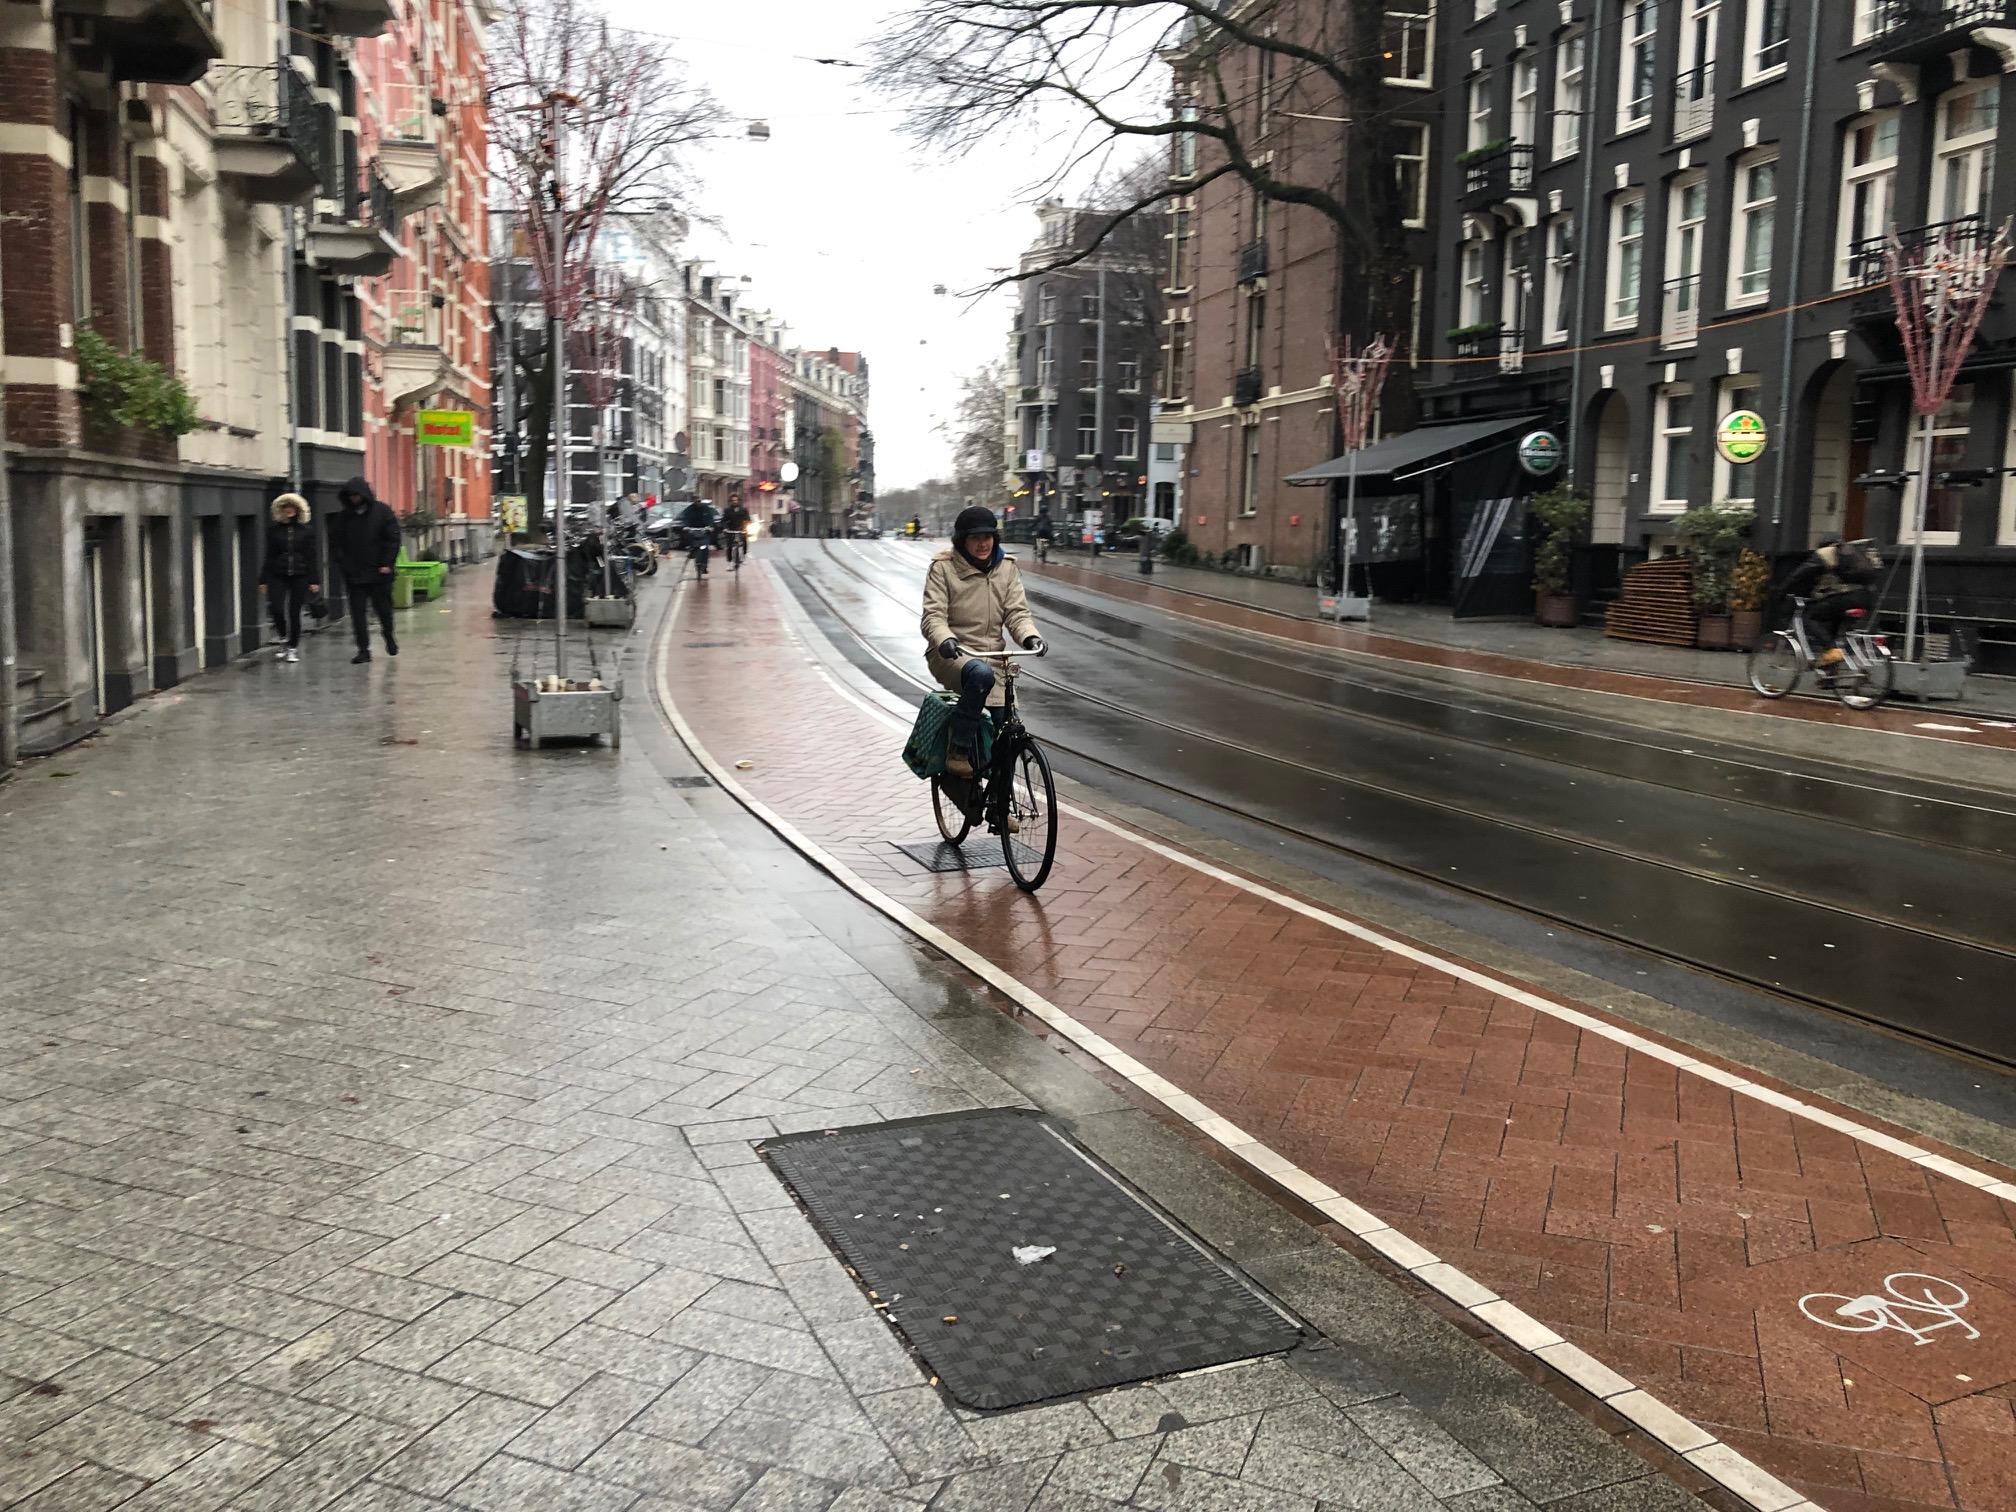 Bike lanes in Amsterdam, Netherlands, Photo bu Dave IltisBike lanes in Amsterdam, Netherlands, Photo bu Dave Iltis